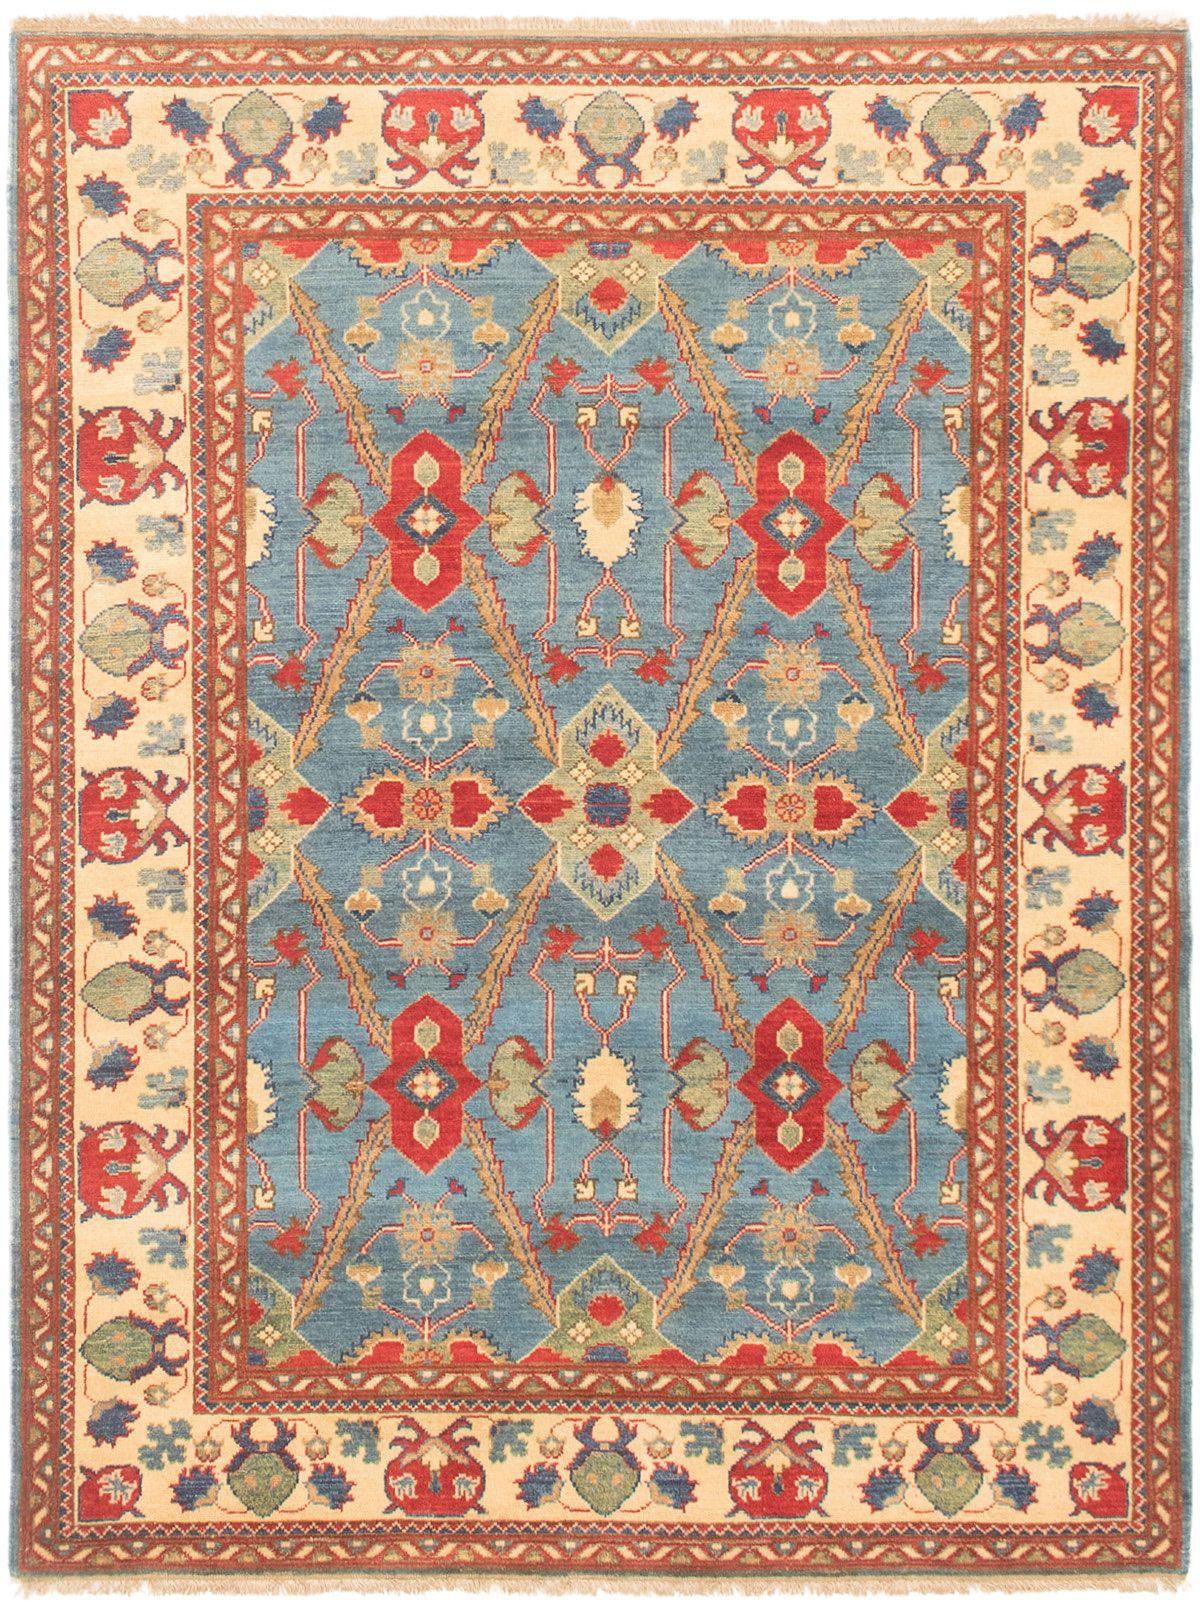 "Hand-knotted Finest Gazni Sky Blue Wool Rug 4'11"" x 6'5"" Size: 4'11"" x 6'5"""